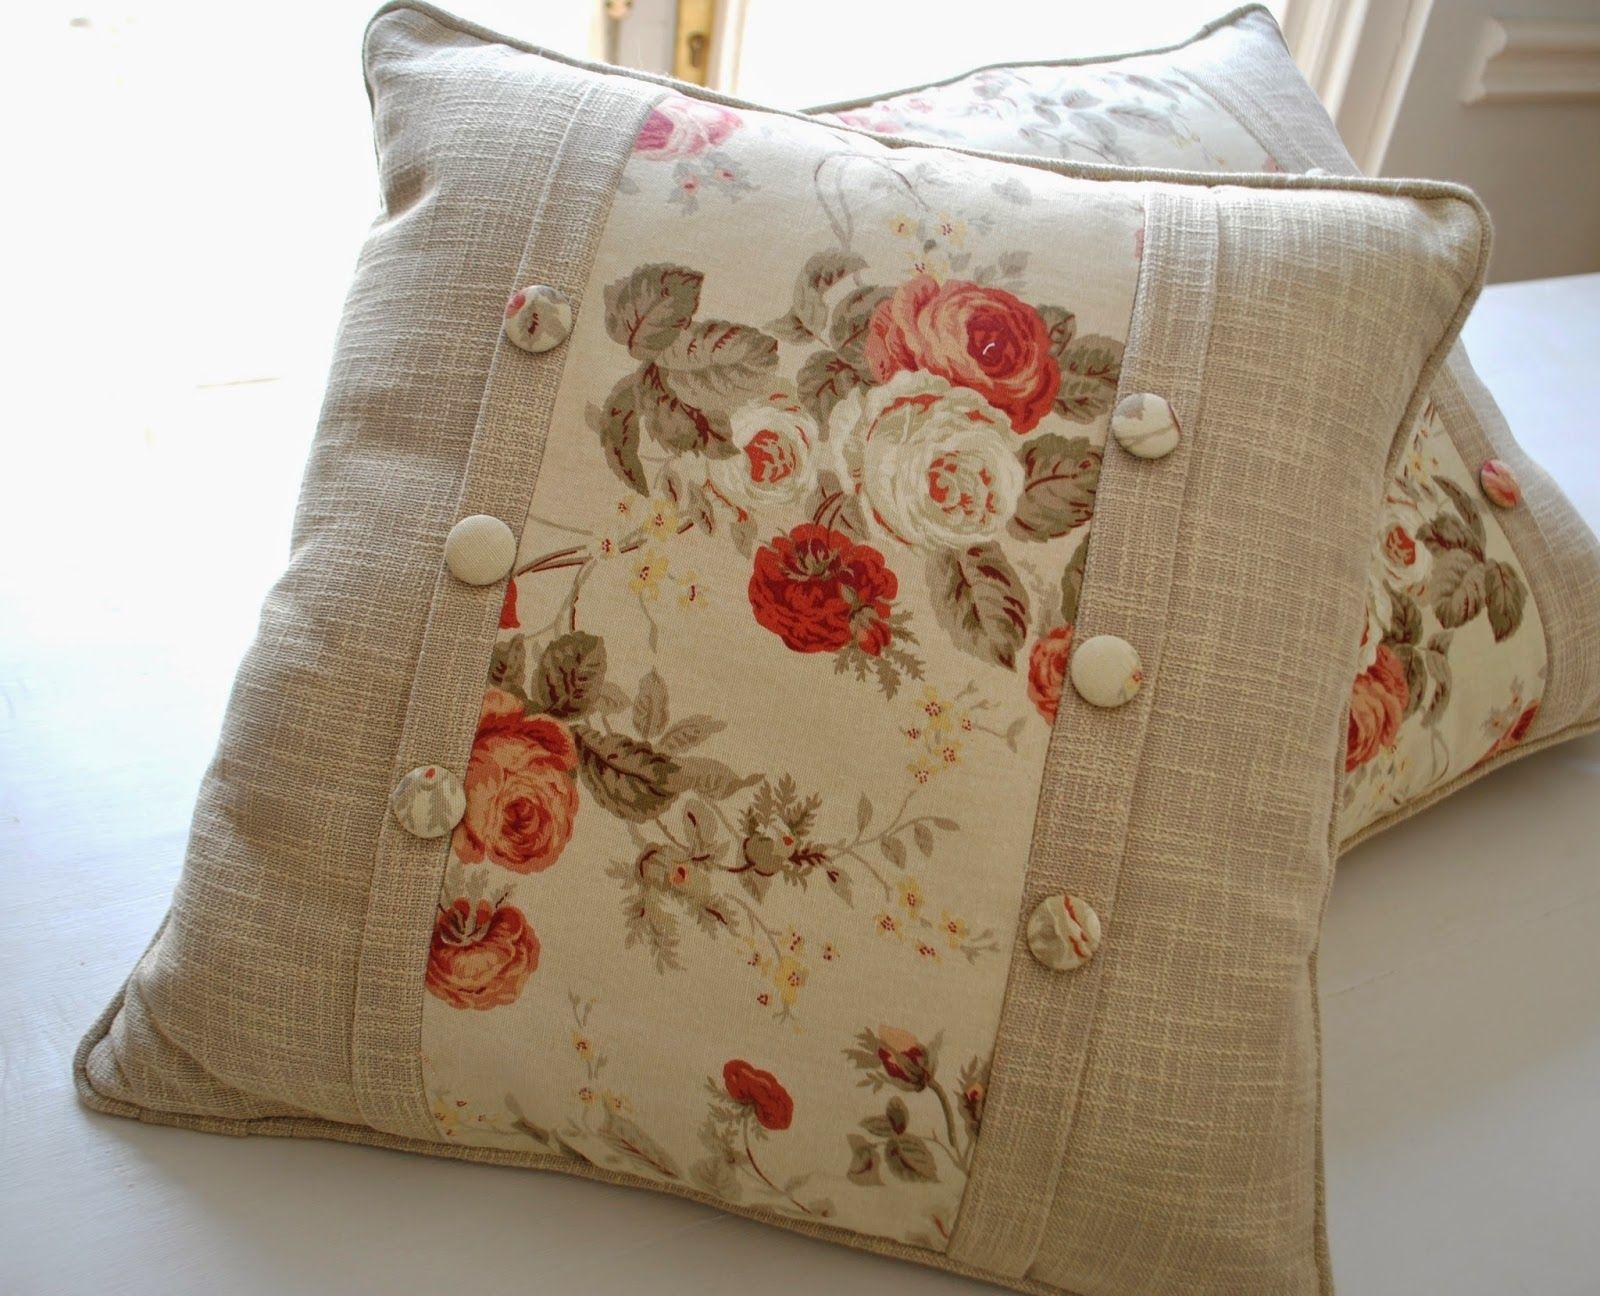 paz montealegre decoraci n cojines decoraci n de casa pinterest kissen kissenbez ge. Black Bedroom Furniture Sets. Home Design Ideas